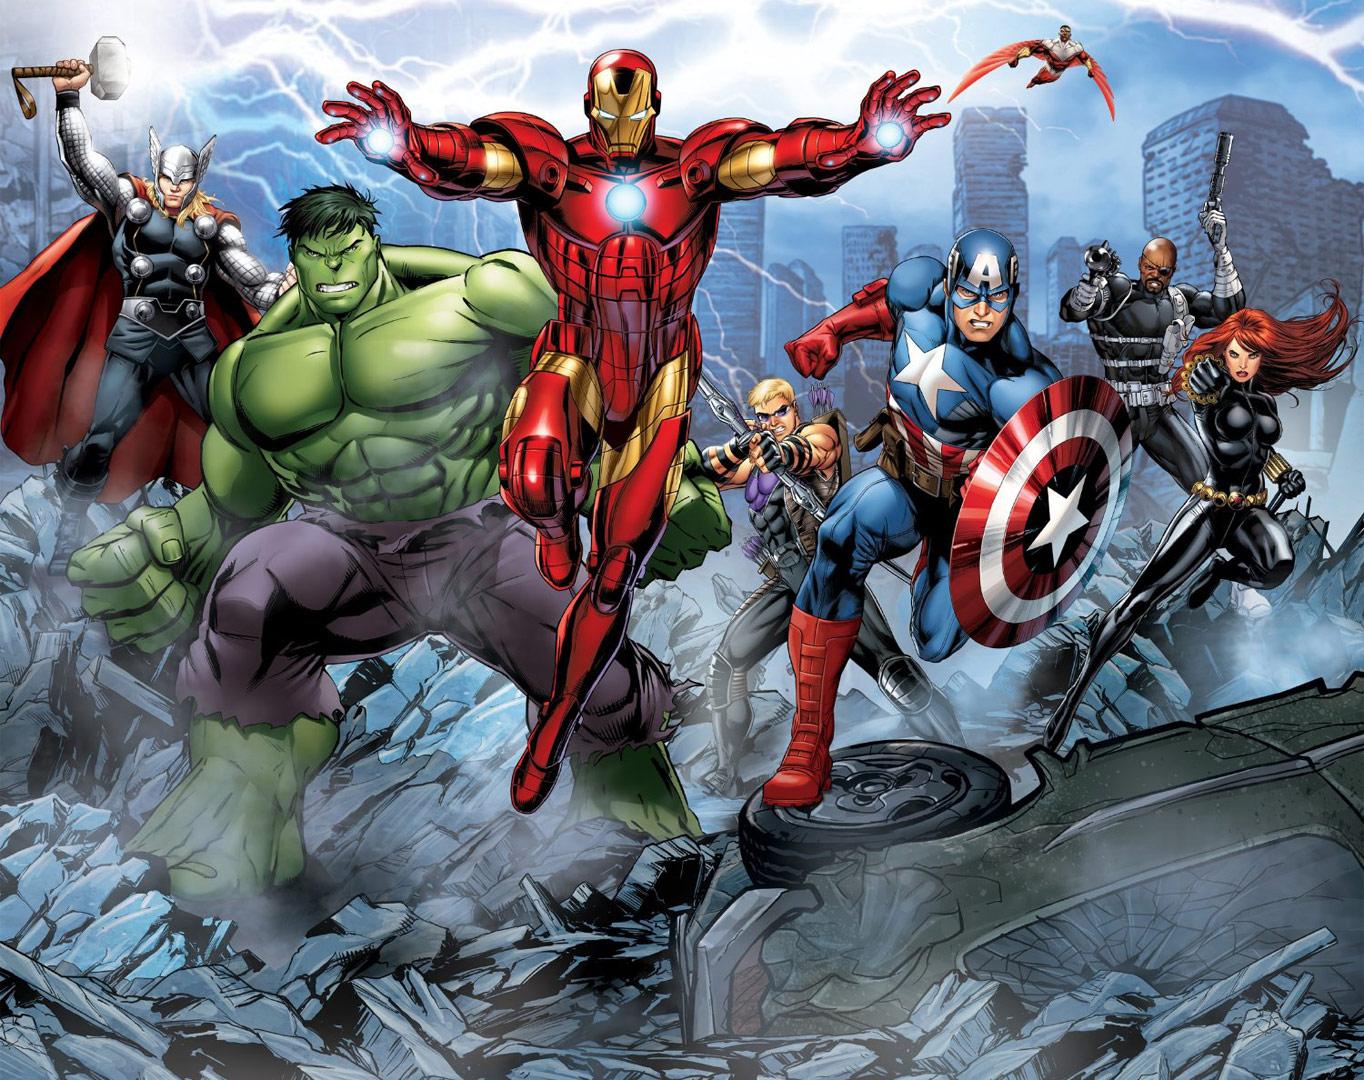 Mind Map Wiki >> Avengers | Marvel's Avengers Assemble Wiki | FANDOM powered by Wikia